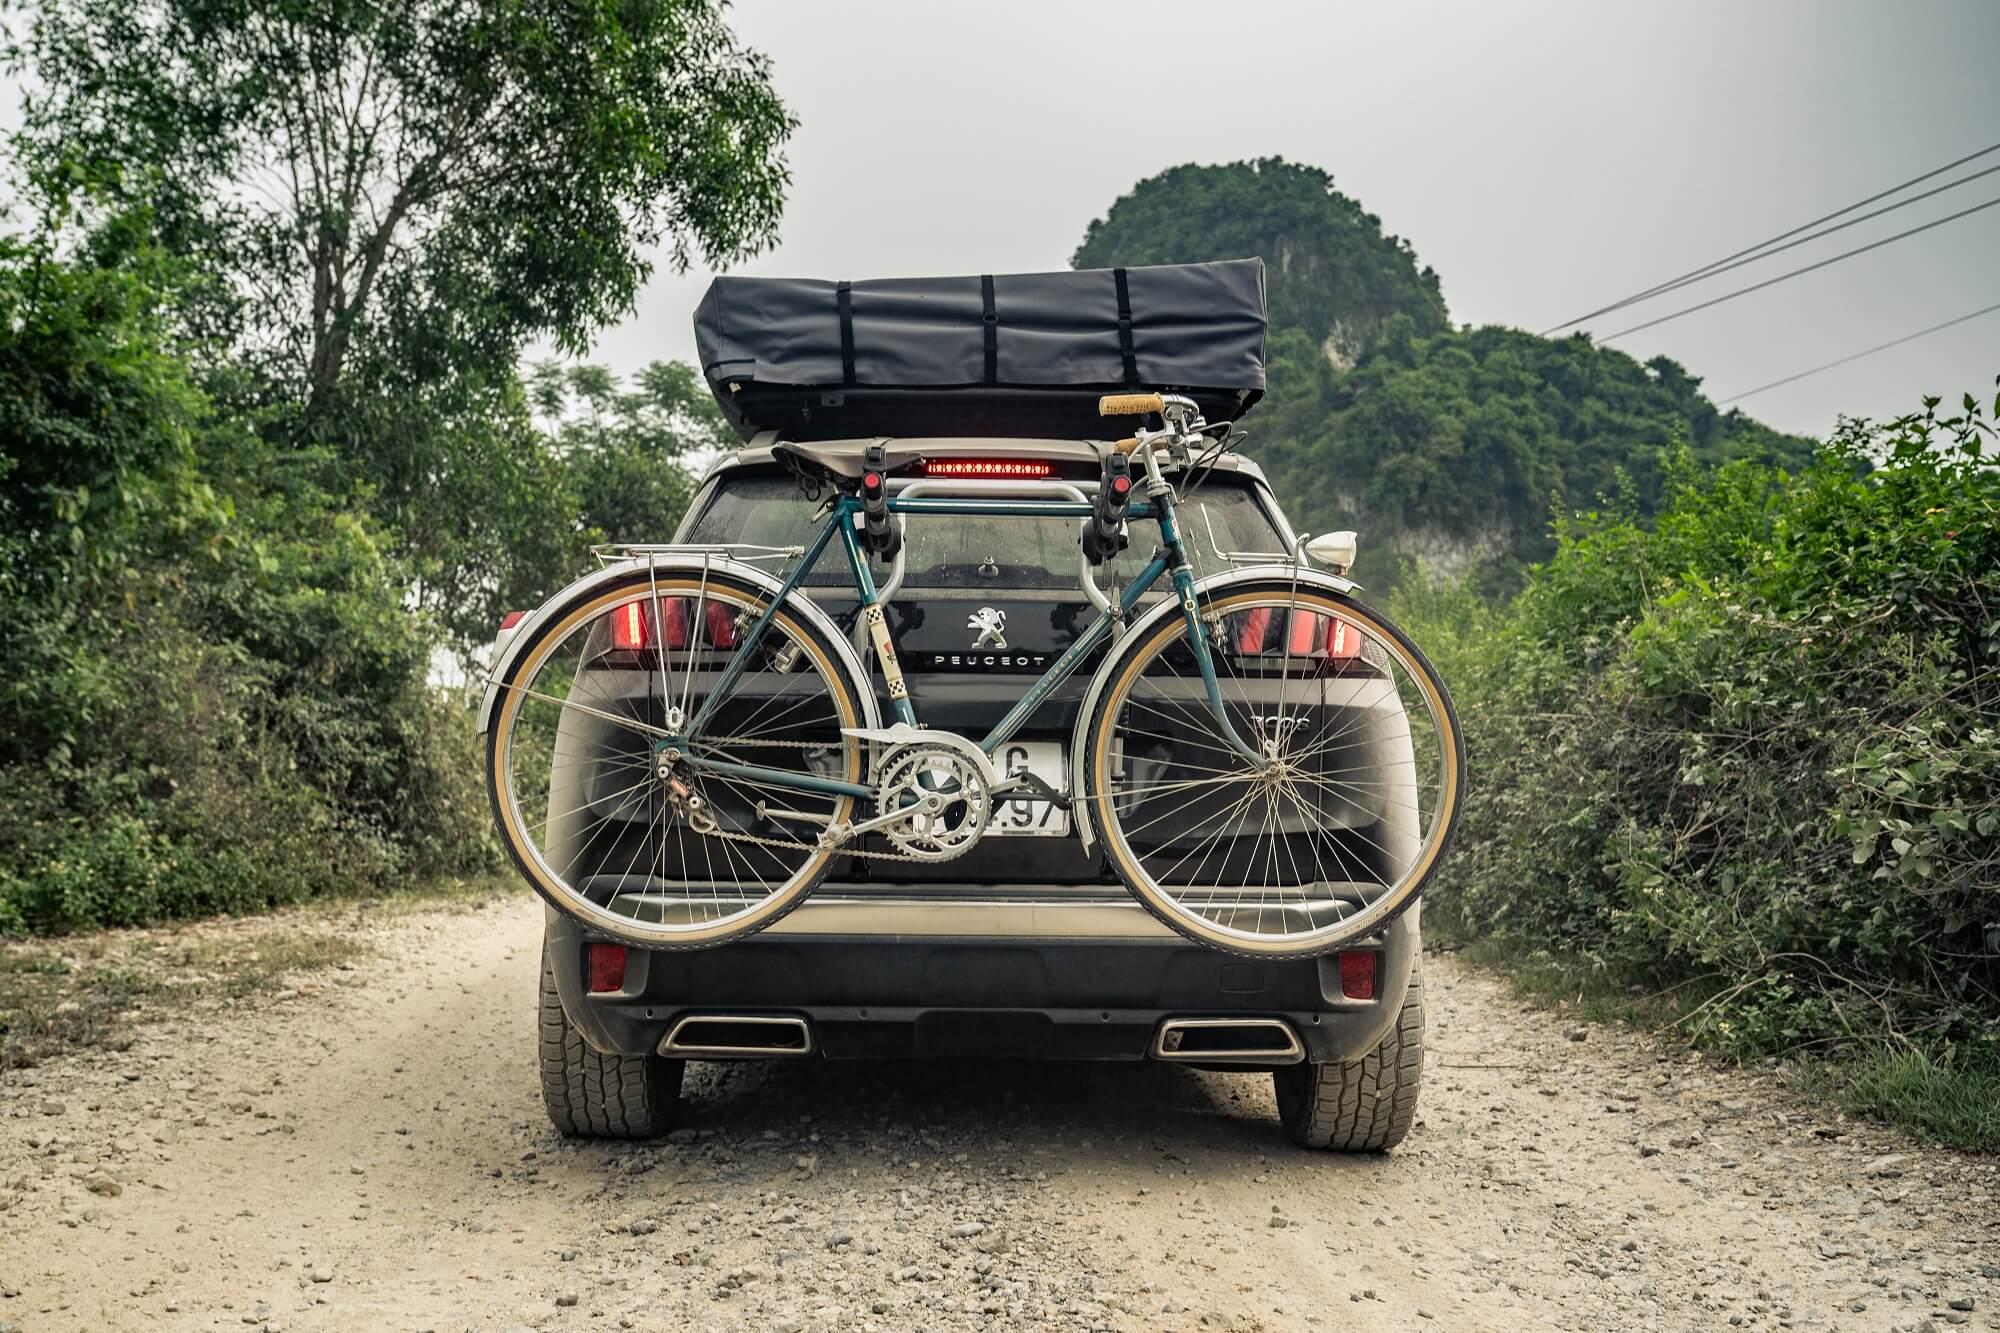 Peugeot 3008 transporte bicicletas